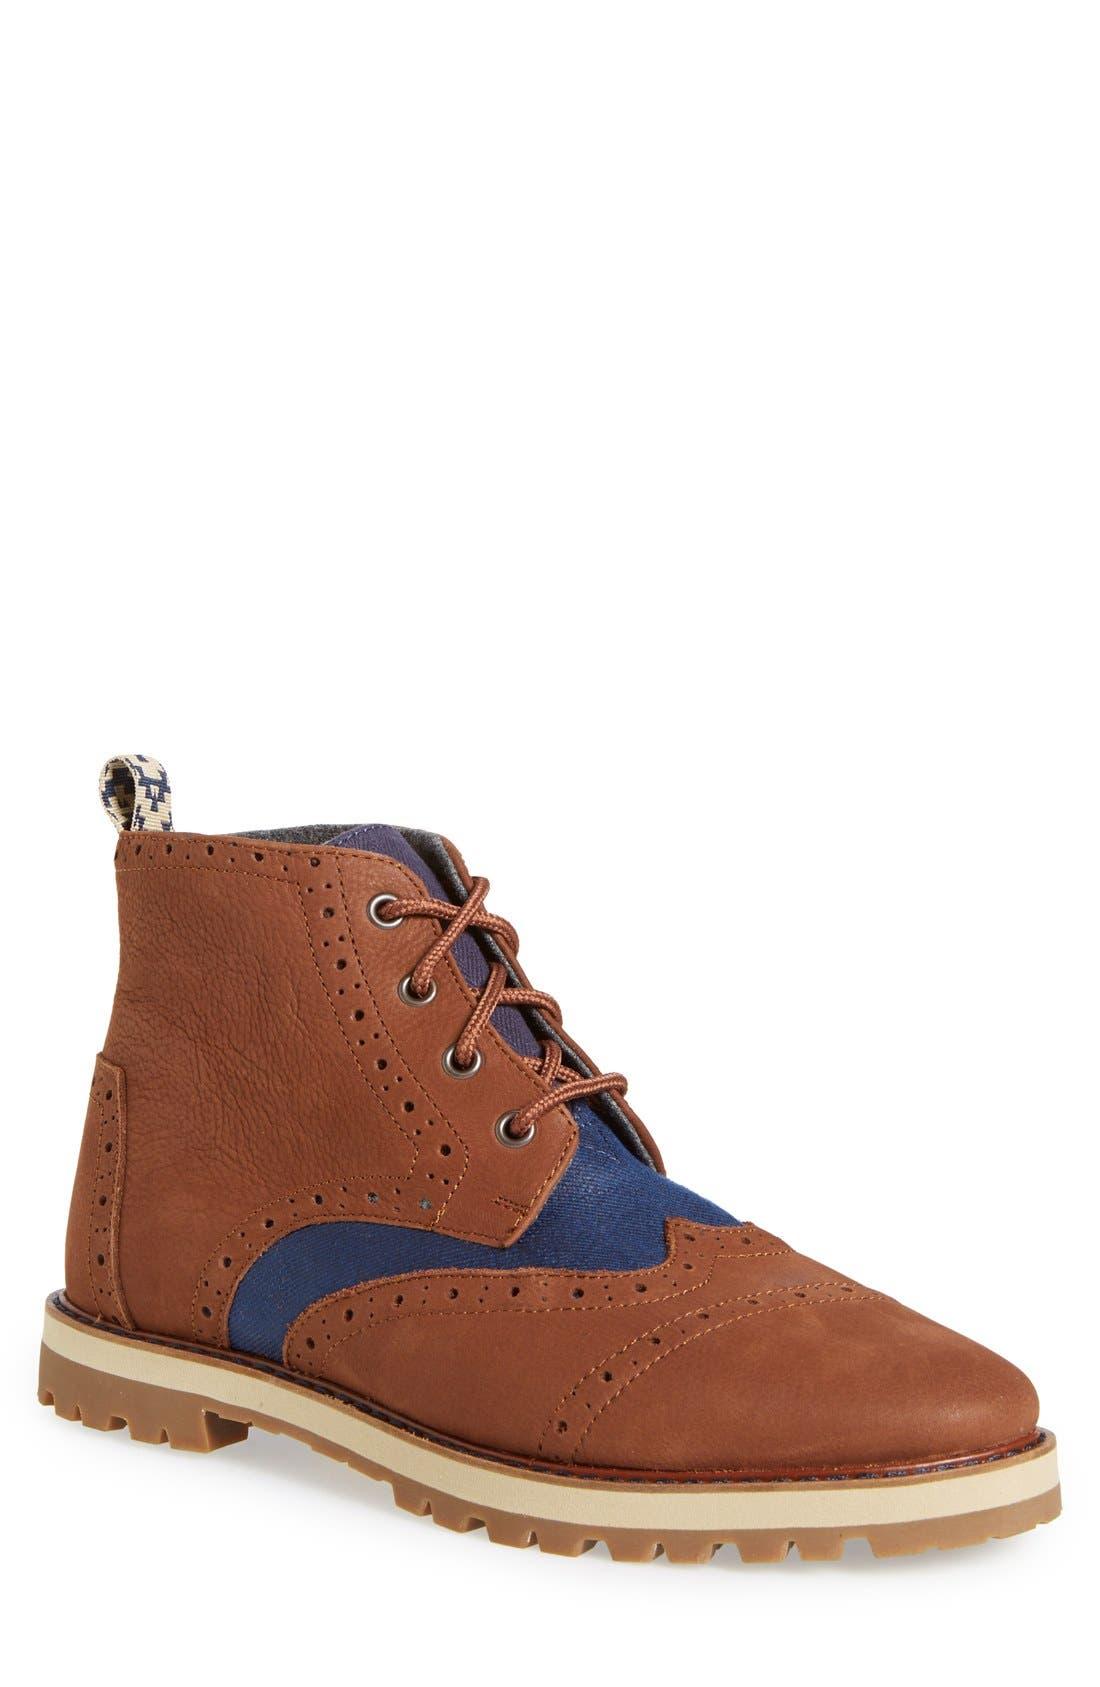 'Brogue' Boot, Main, color, 200